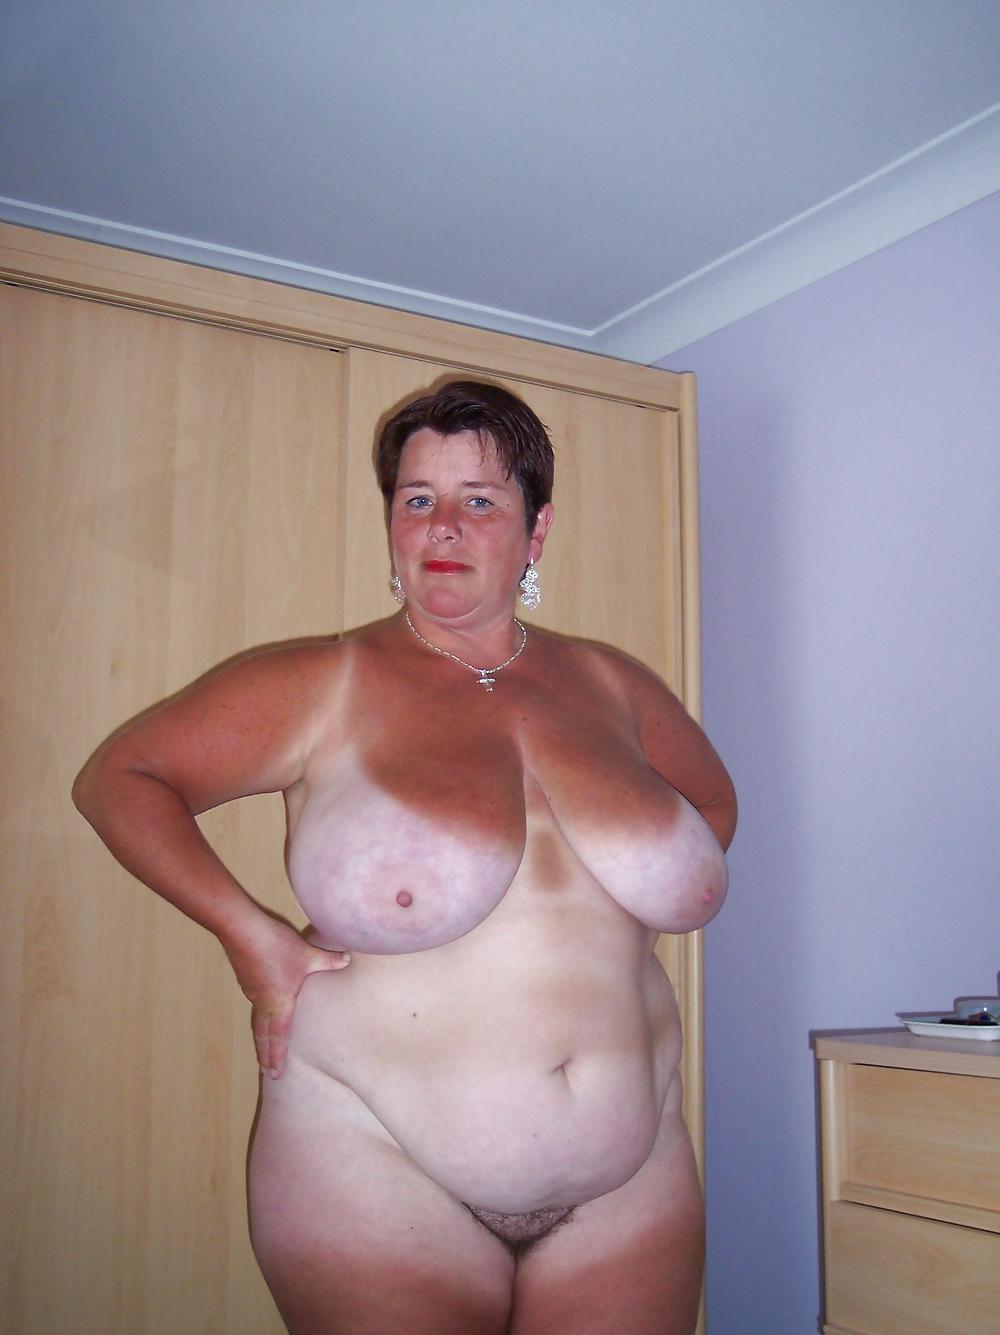 golie-starie-zhirnie-tetki-foto